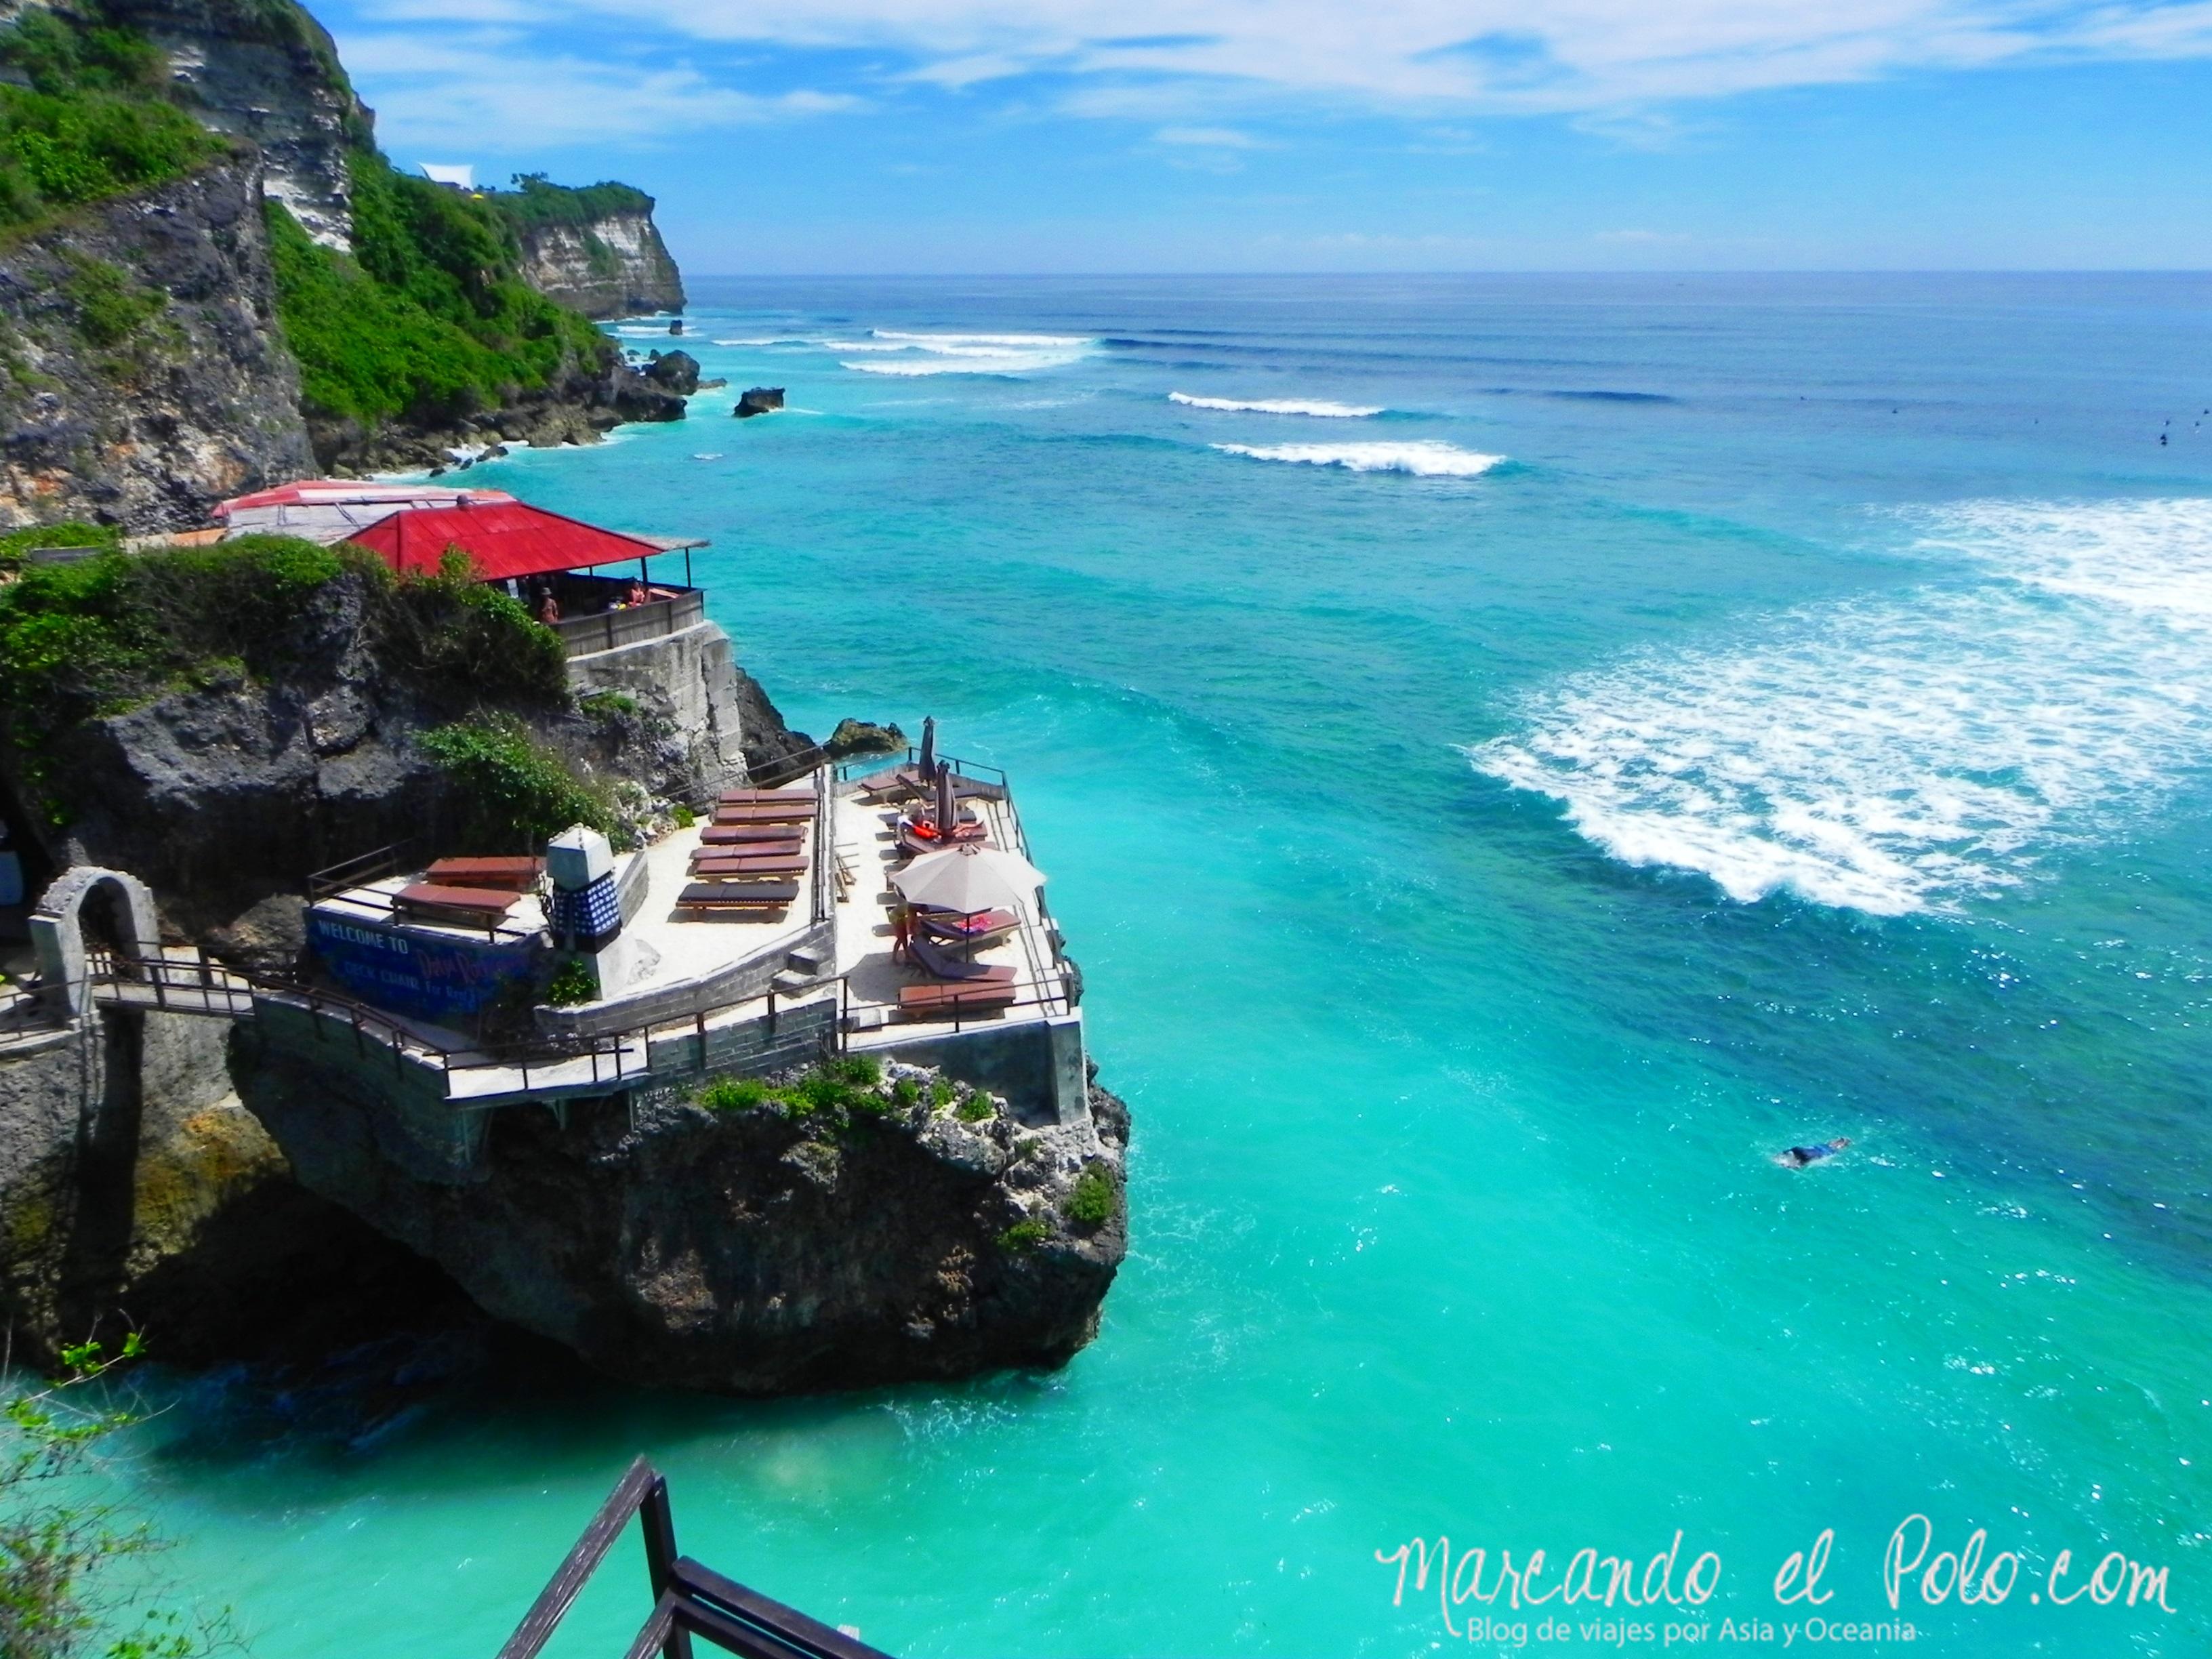 Que ver en Bali - Playa Uluwatu